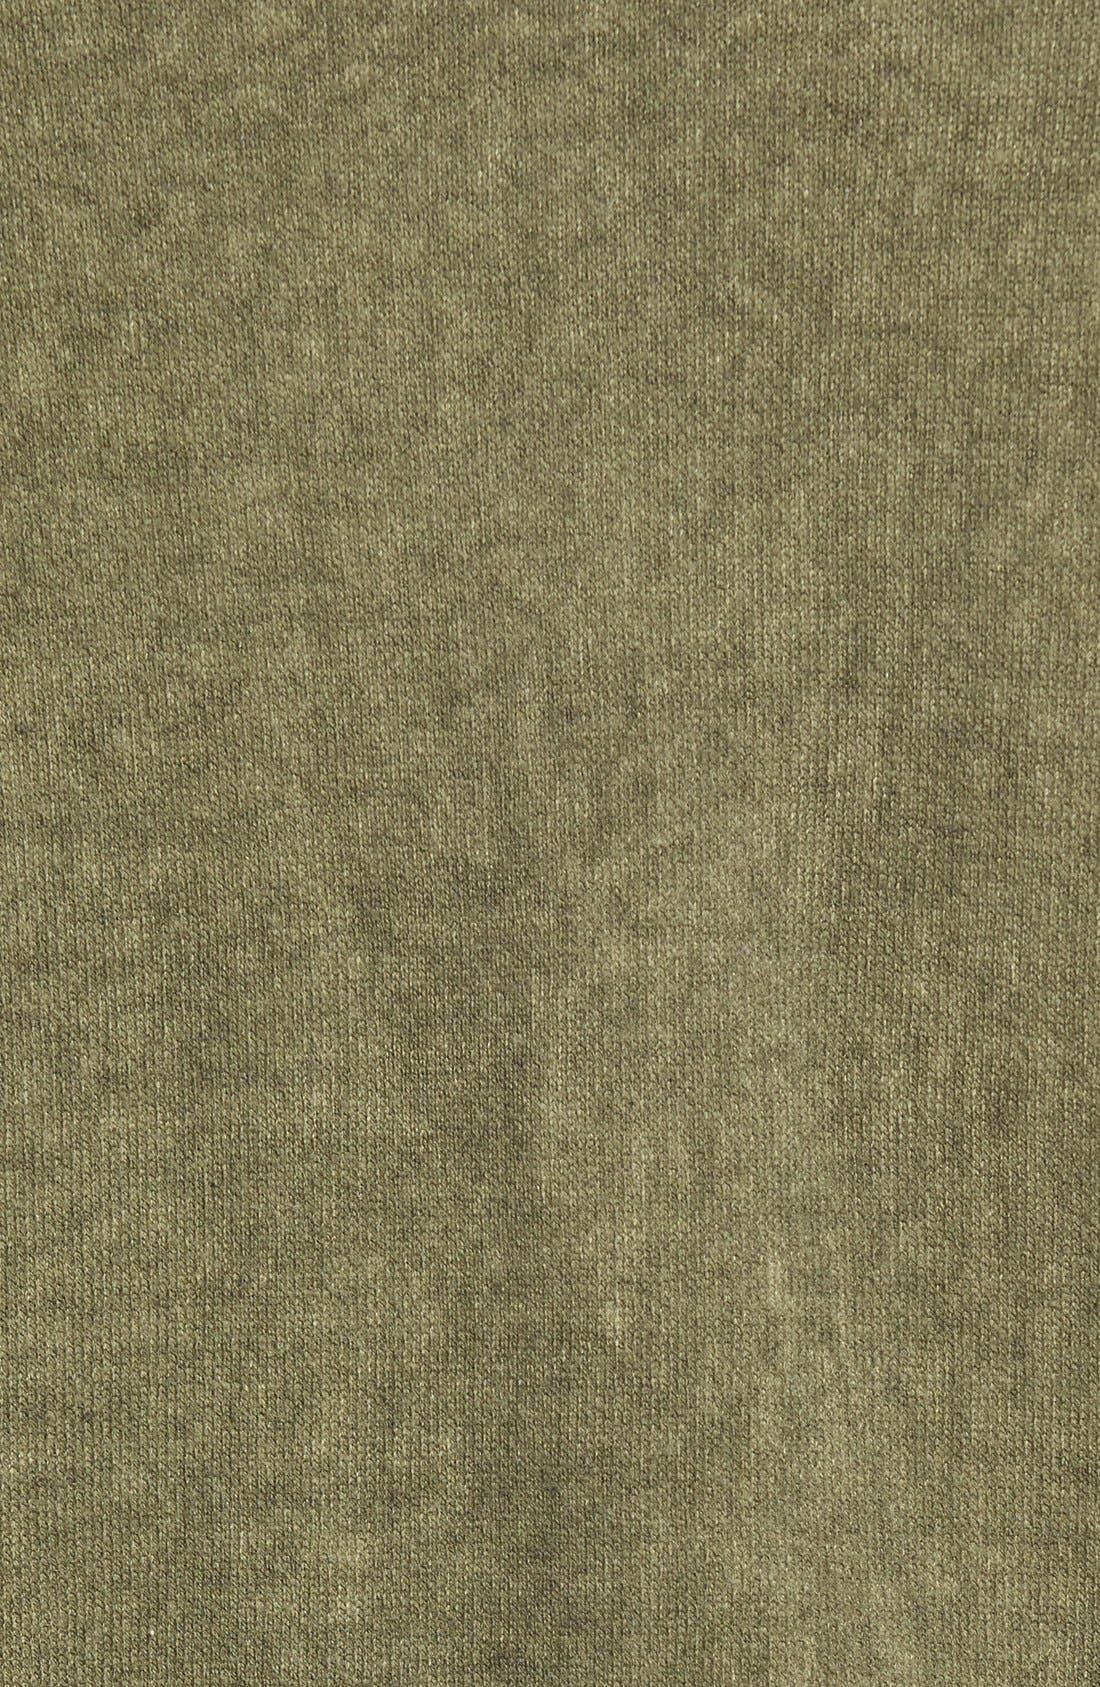 Mace Crewneck Sweater,                             Alternate thumbnail 6, color,                             316